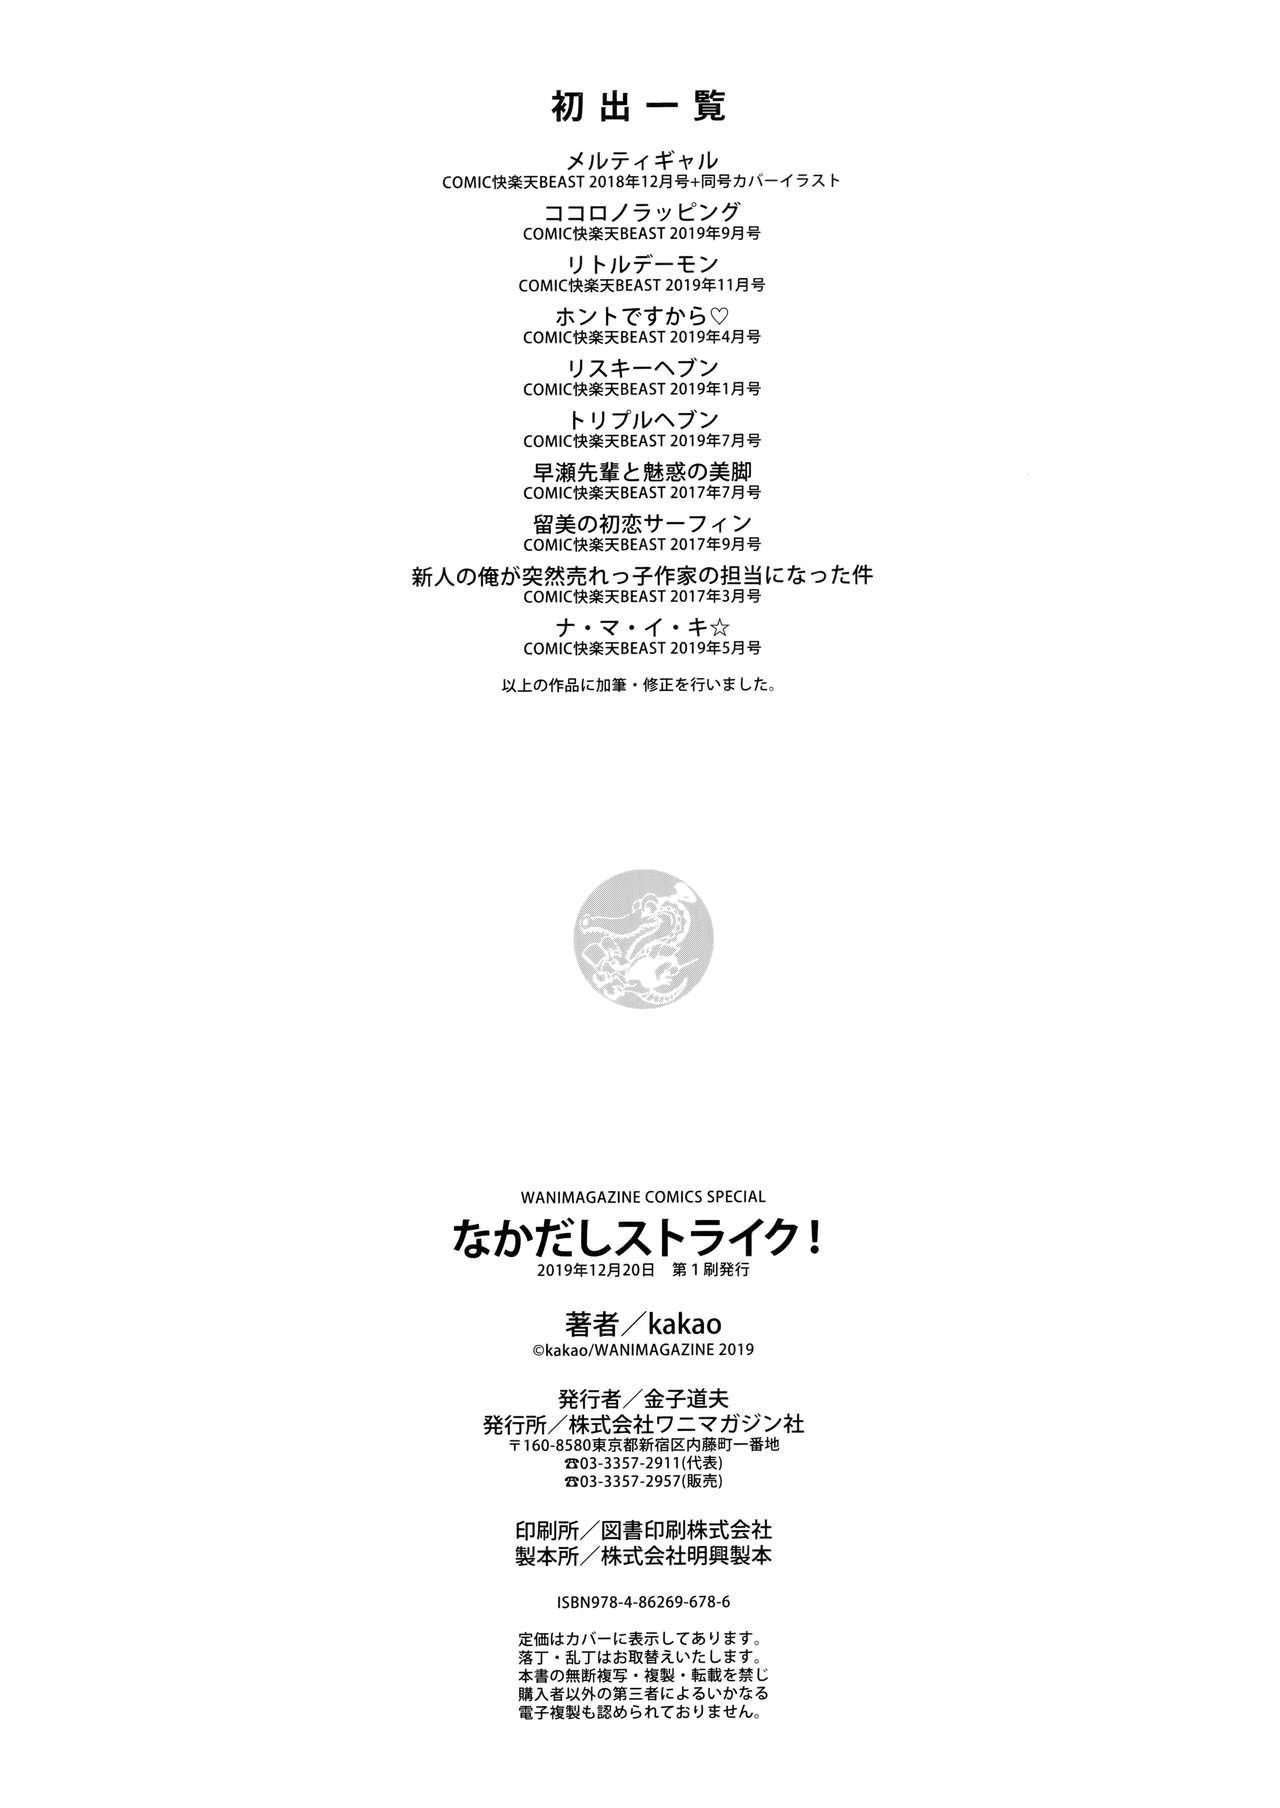 Nakadashi Strike! - Winning strike! 201